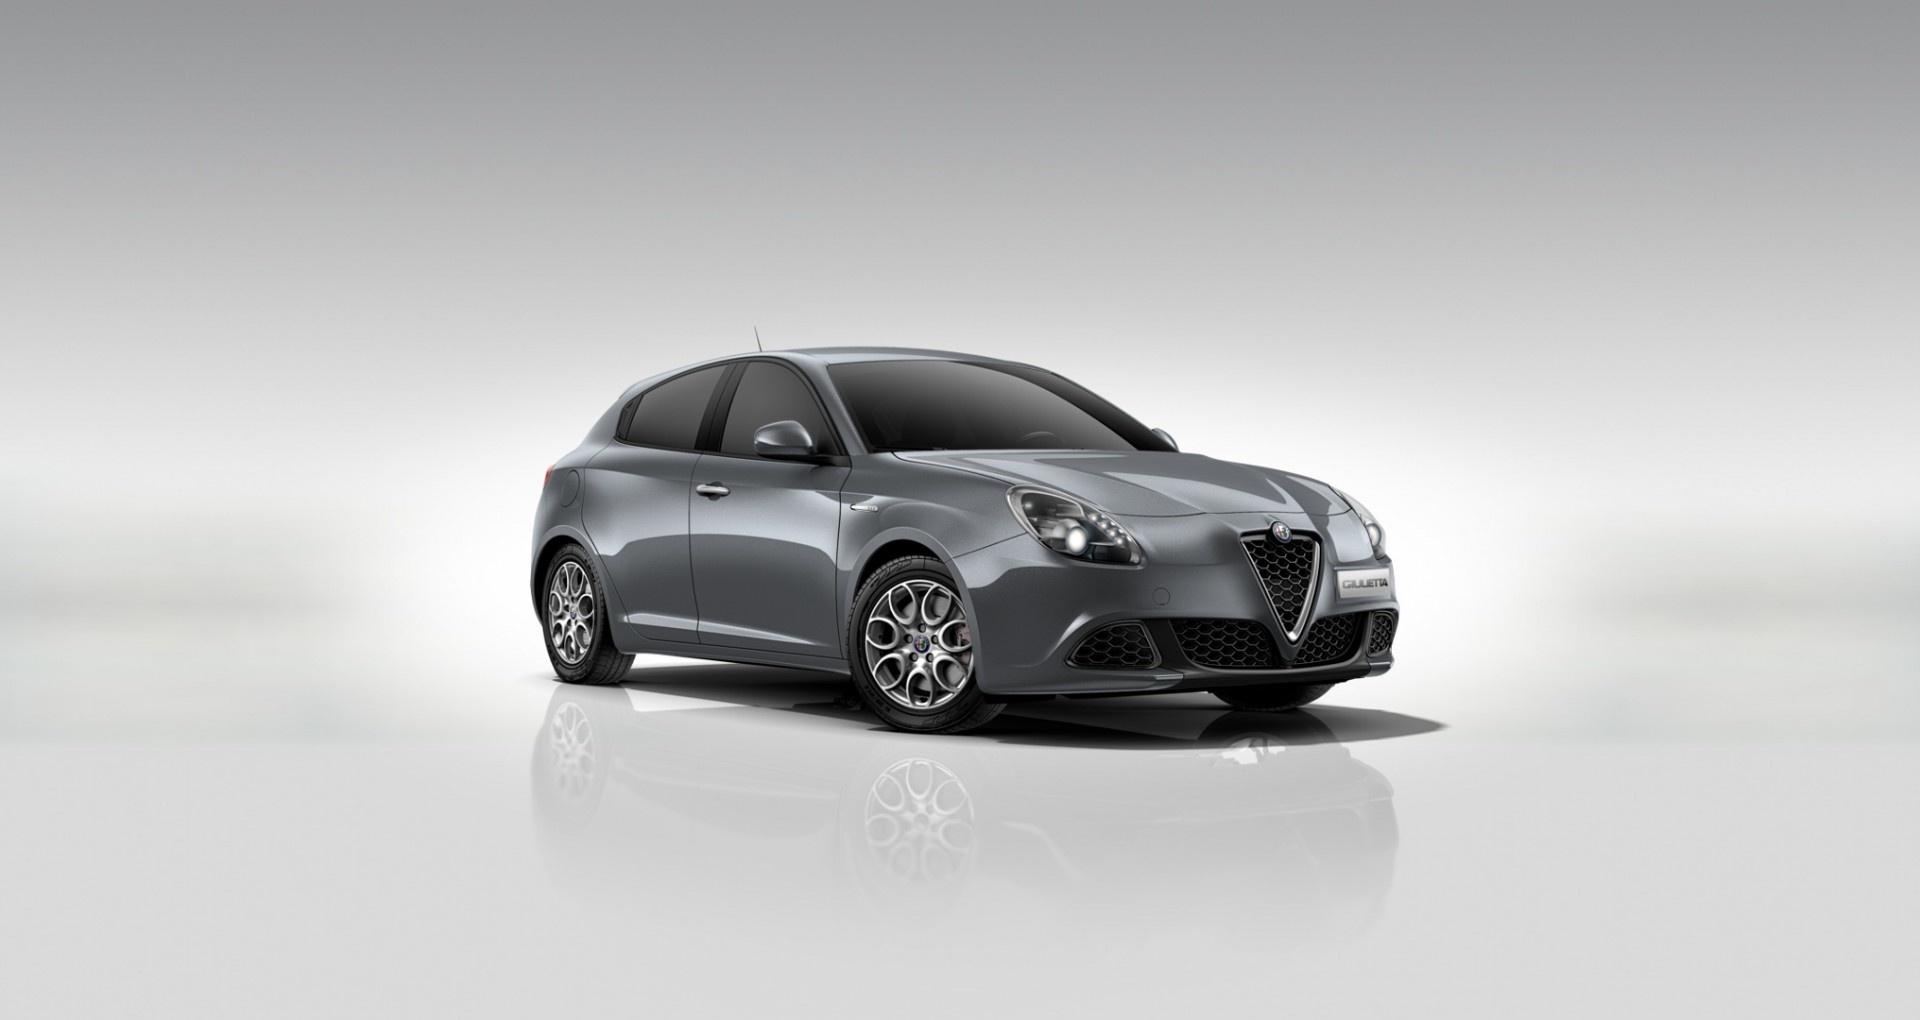 Alfa Romeo Giulietta 1.4 T-JET 120CV